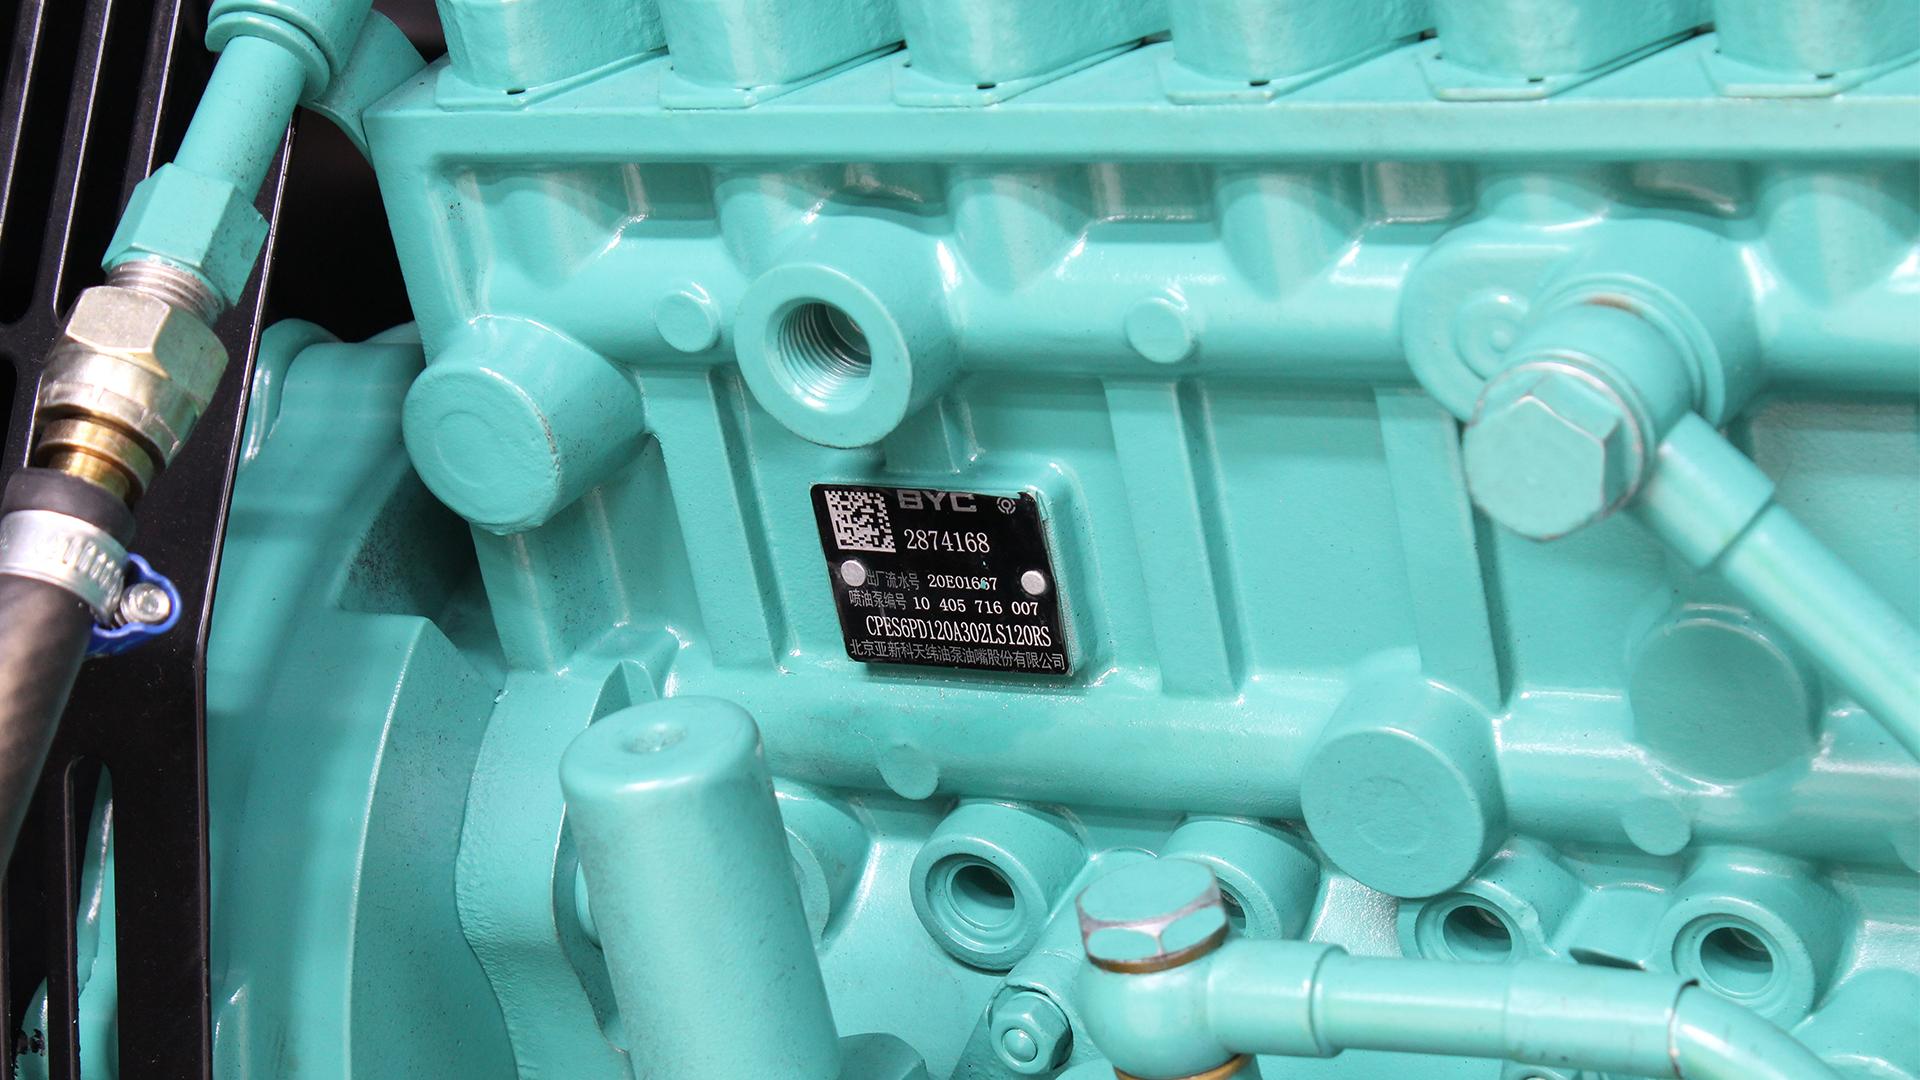 Fuel injector system on Cummins 6ZTAA13 engine